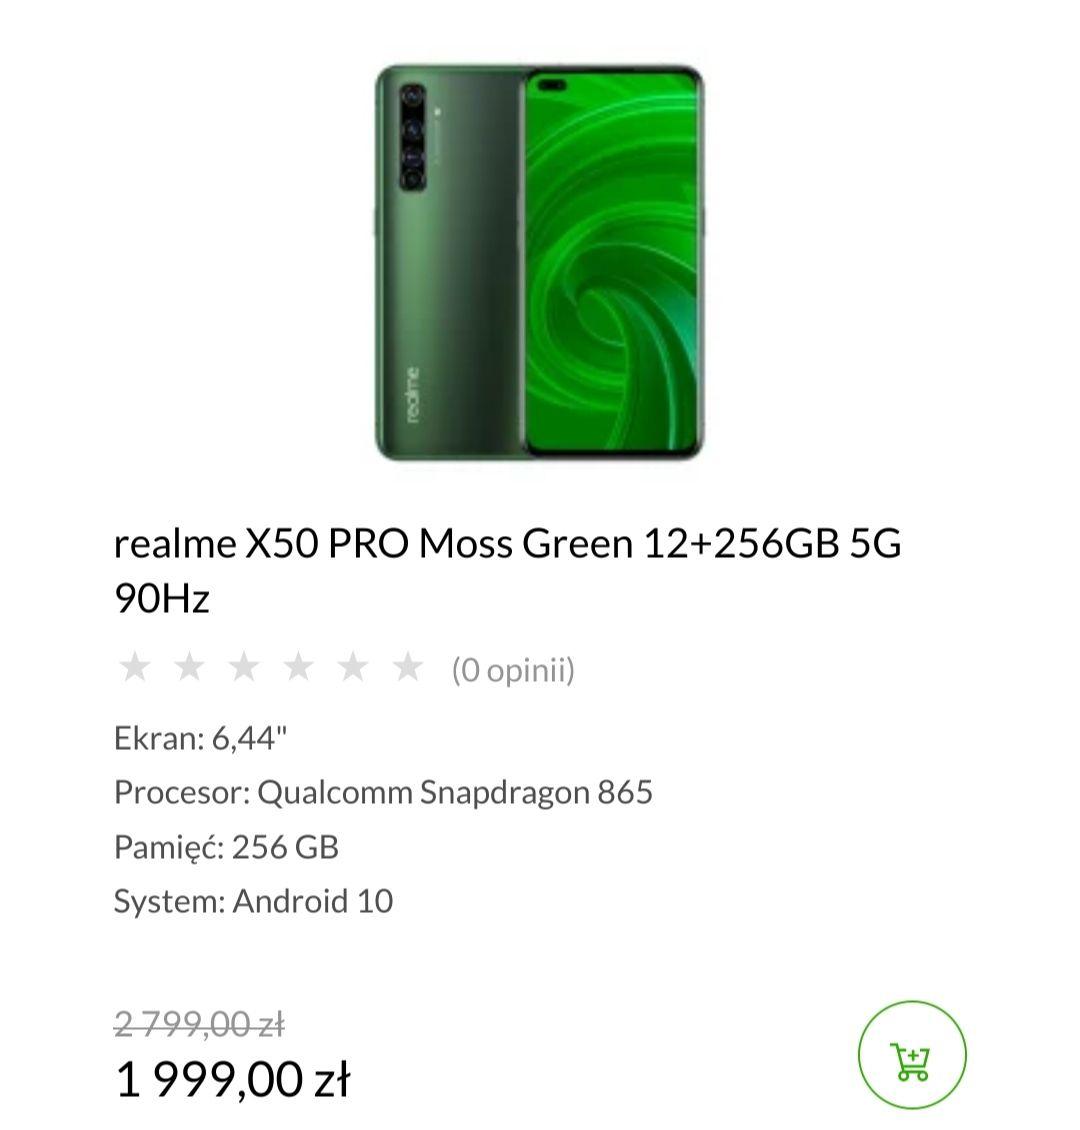 Realme X50 PRO Moss Green 12+256GB 5G 90Hz